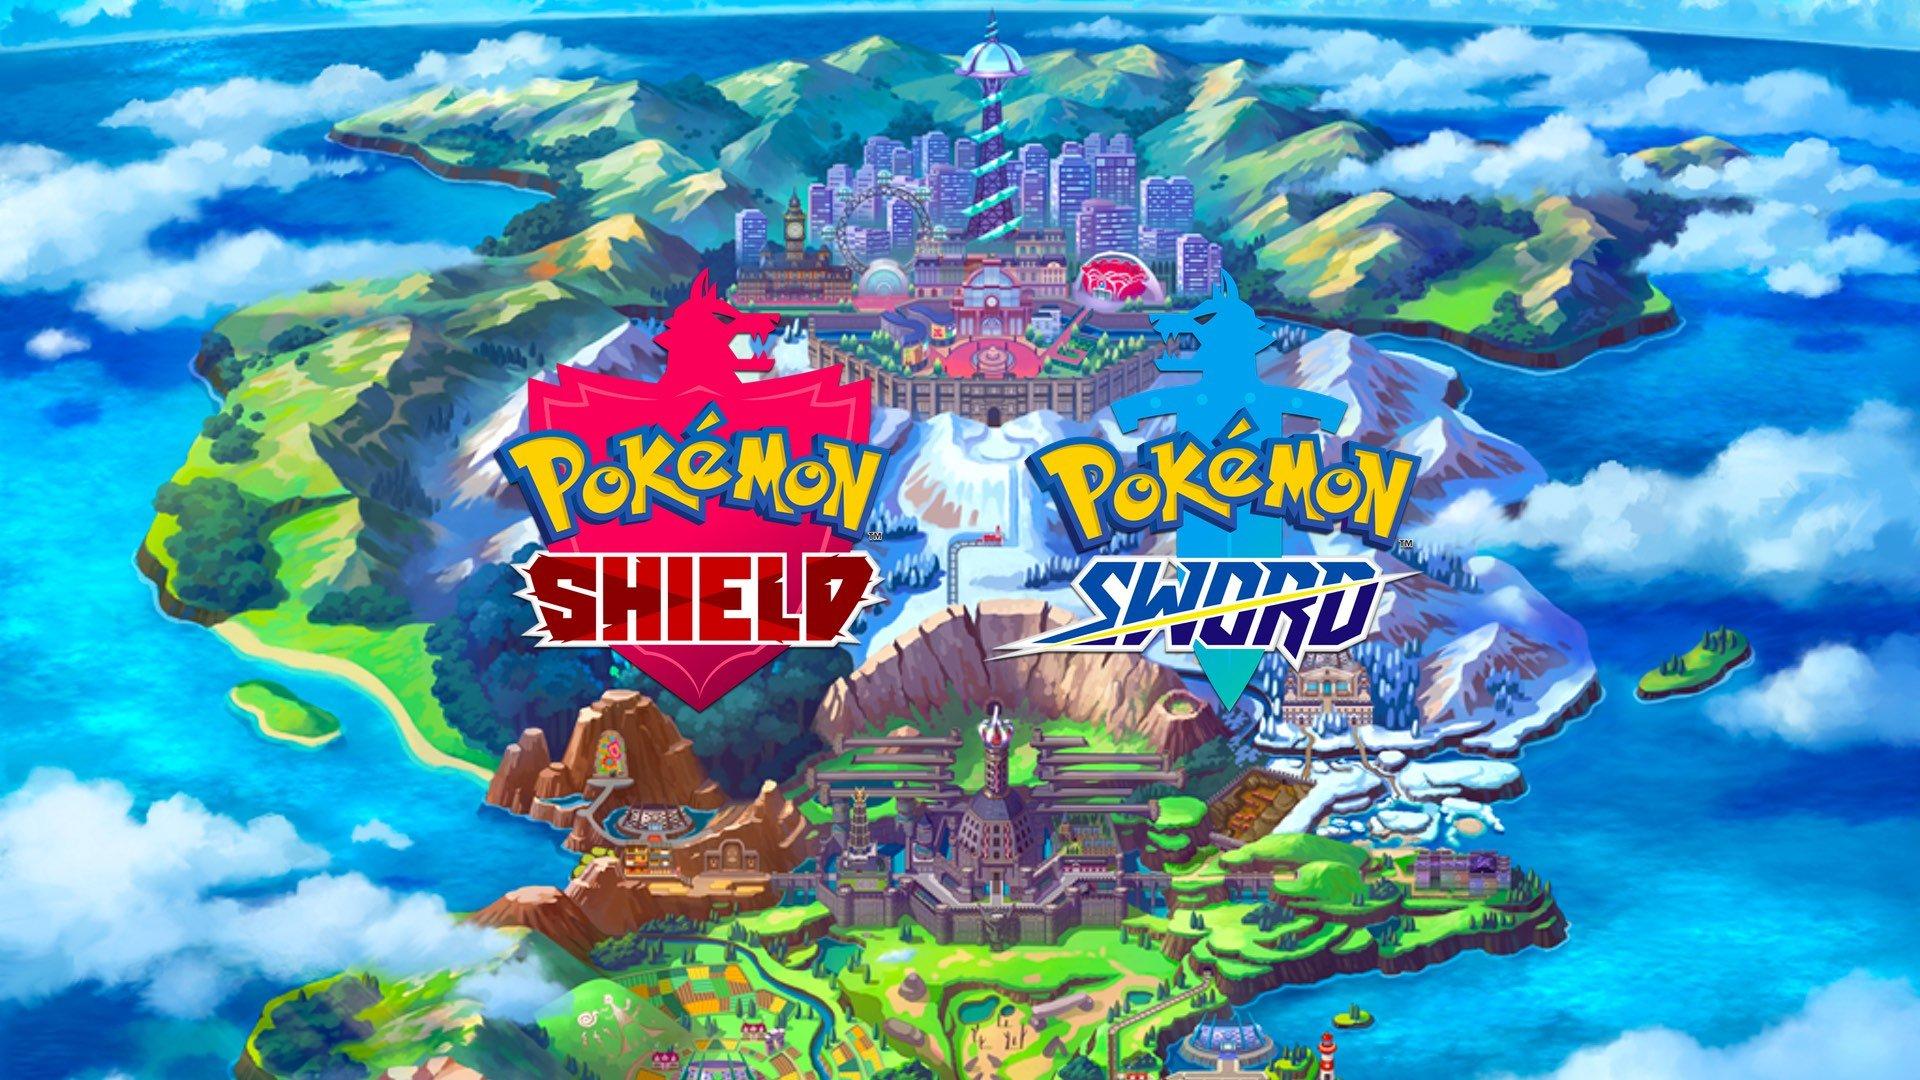 Pokemon Sword And Pokemon Shield Otakuguru Pokemon Anime And